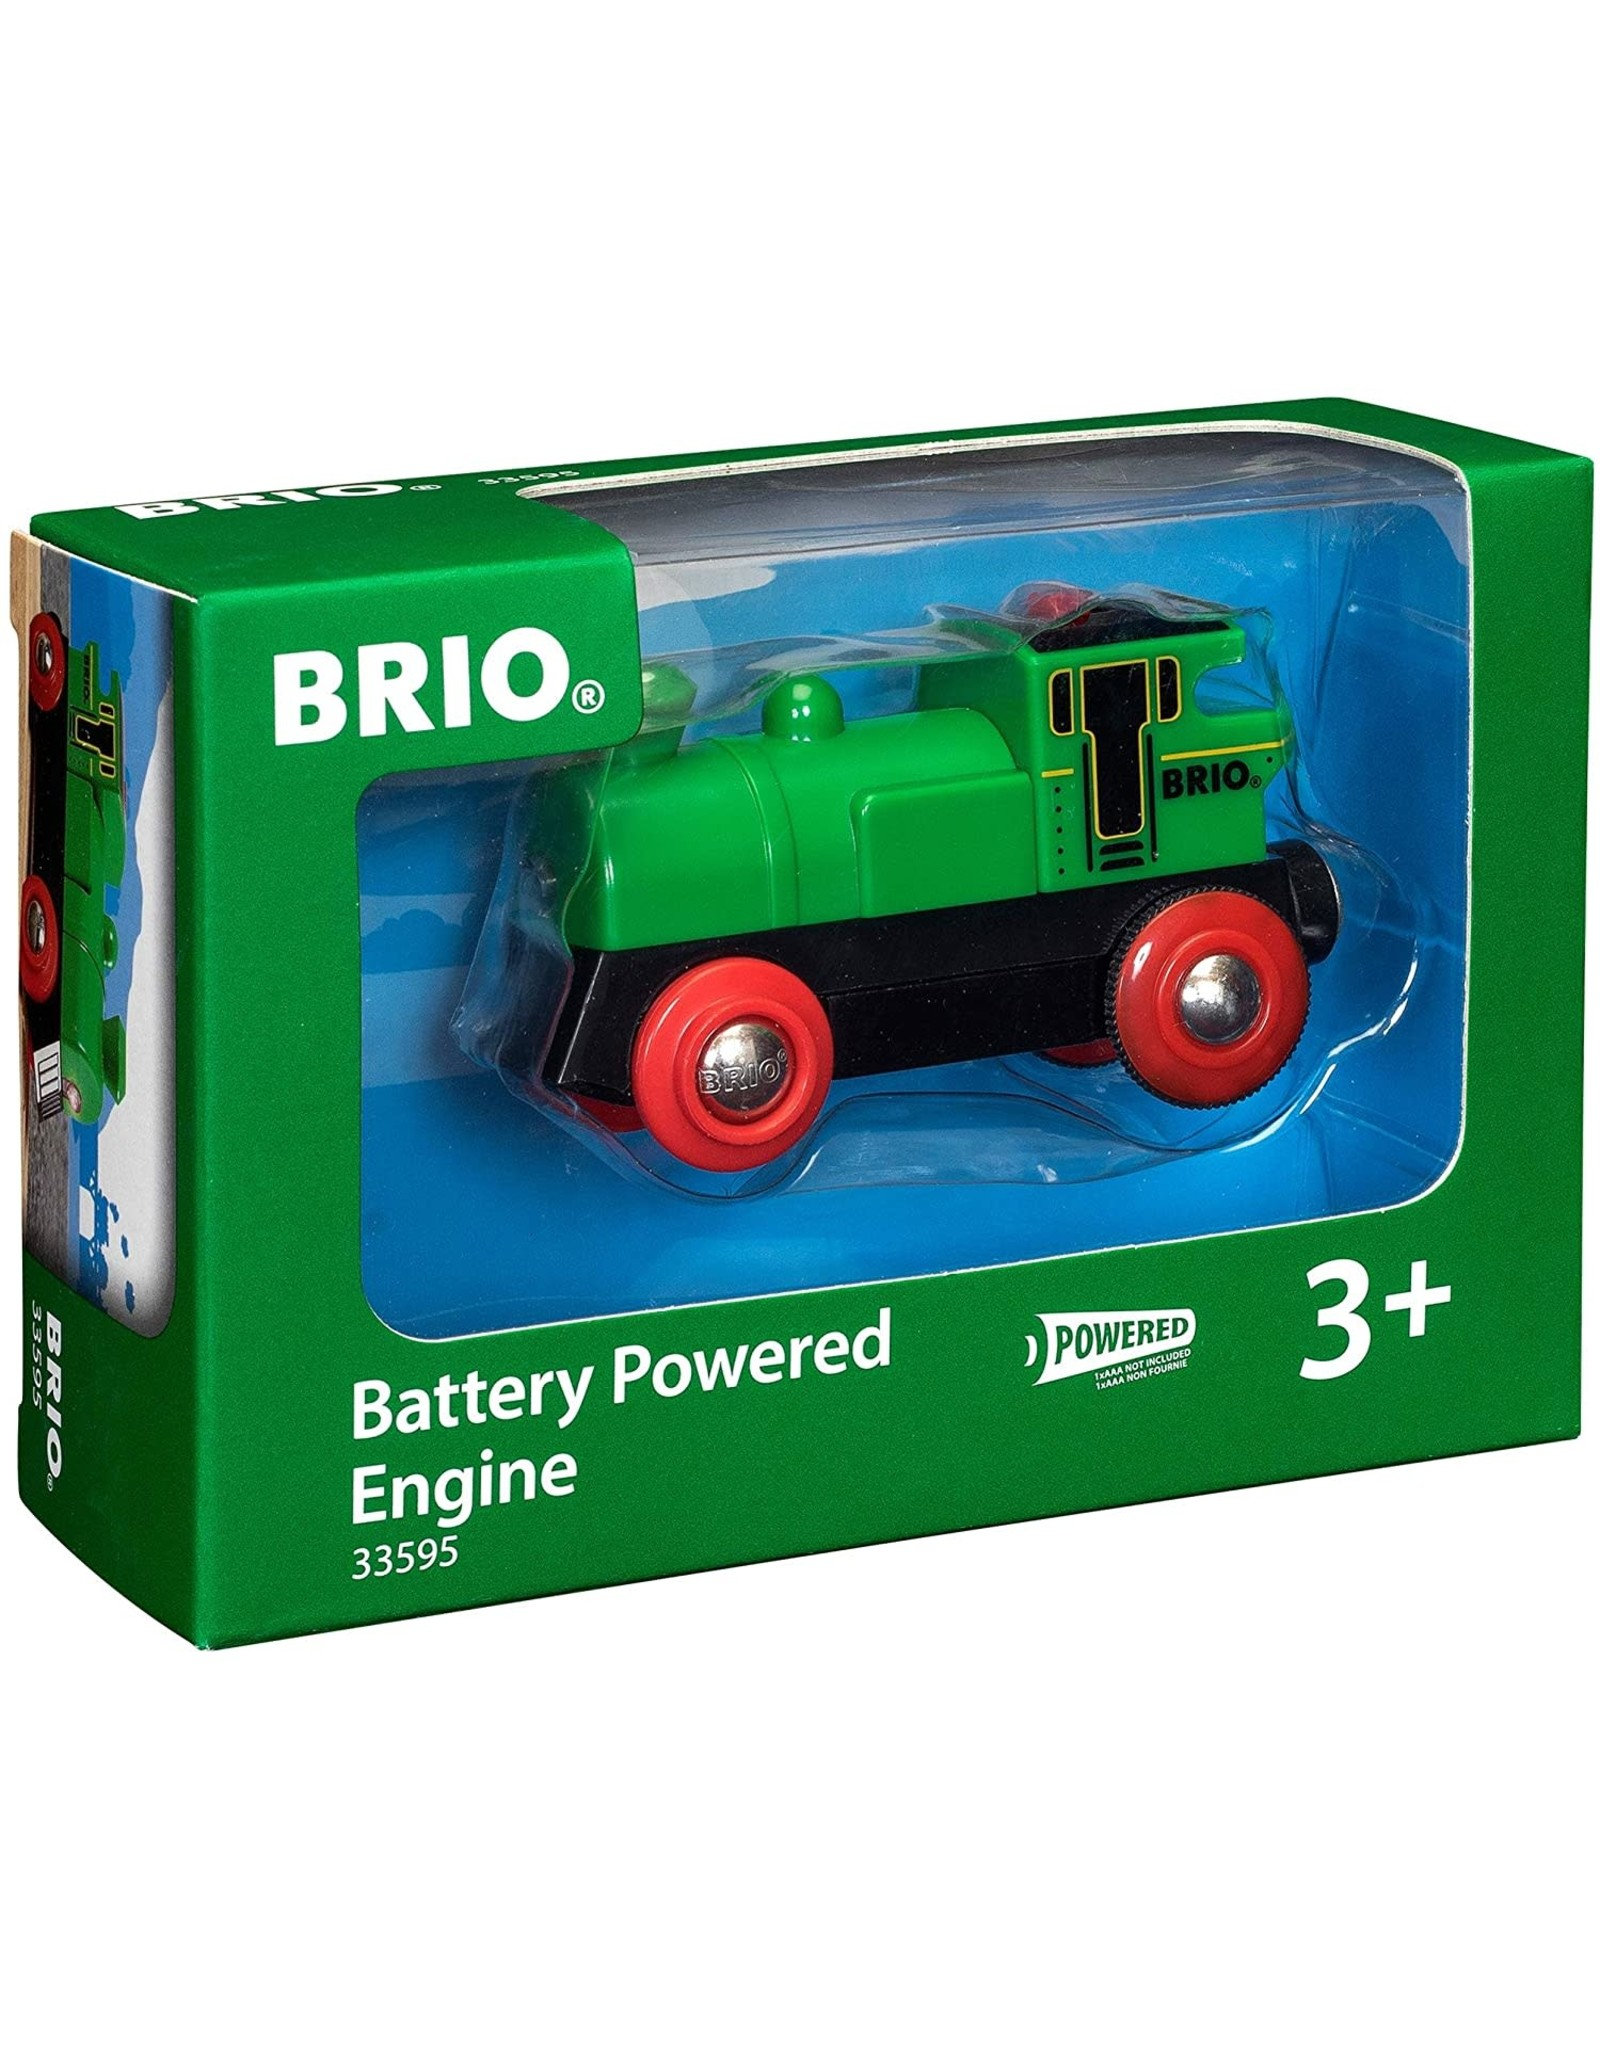 Brio Battery-Powered Engine